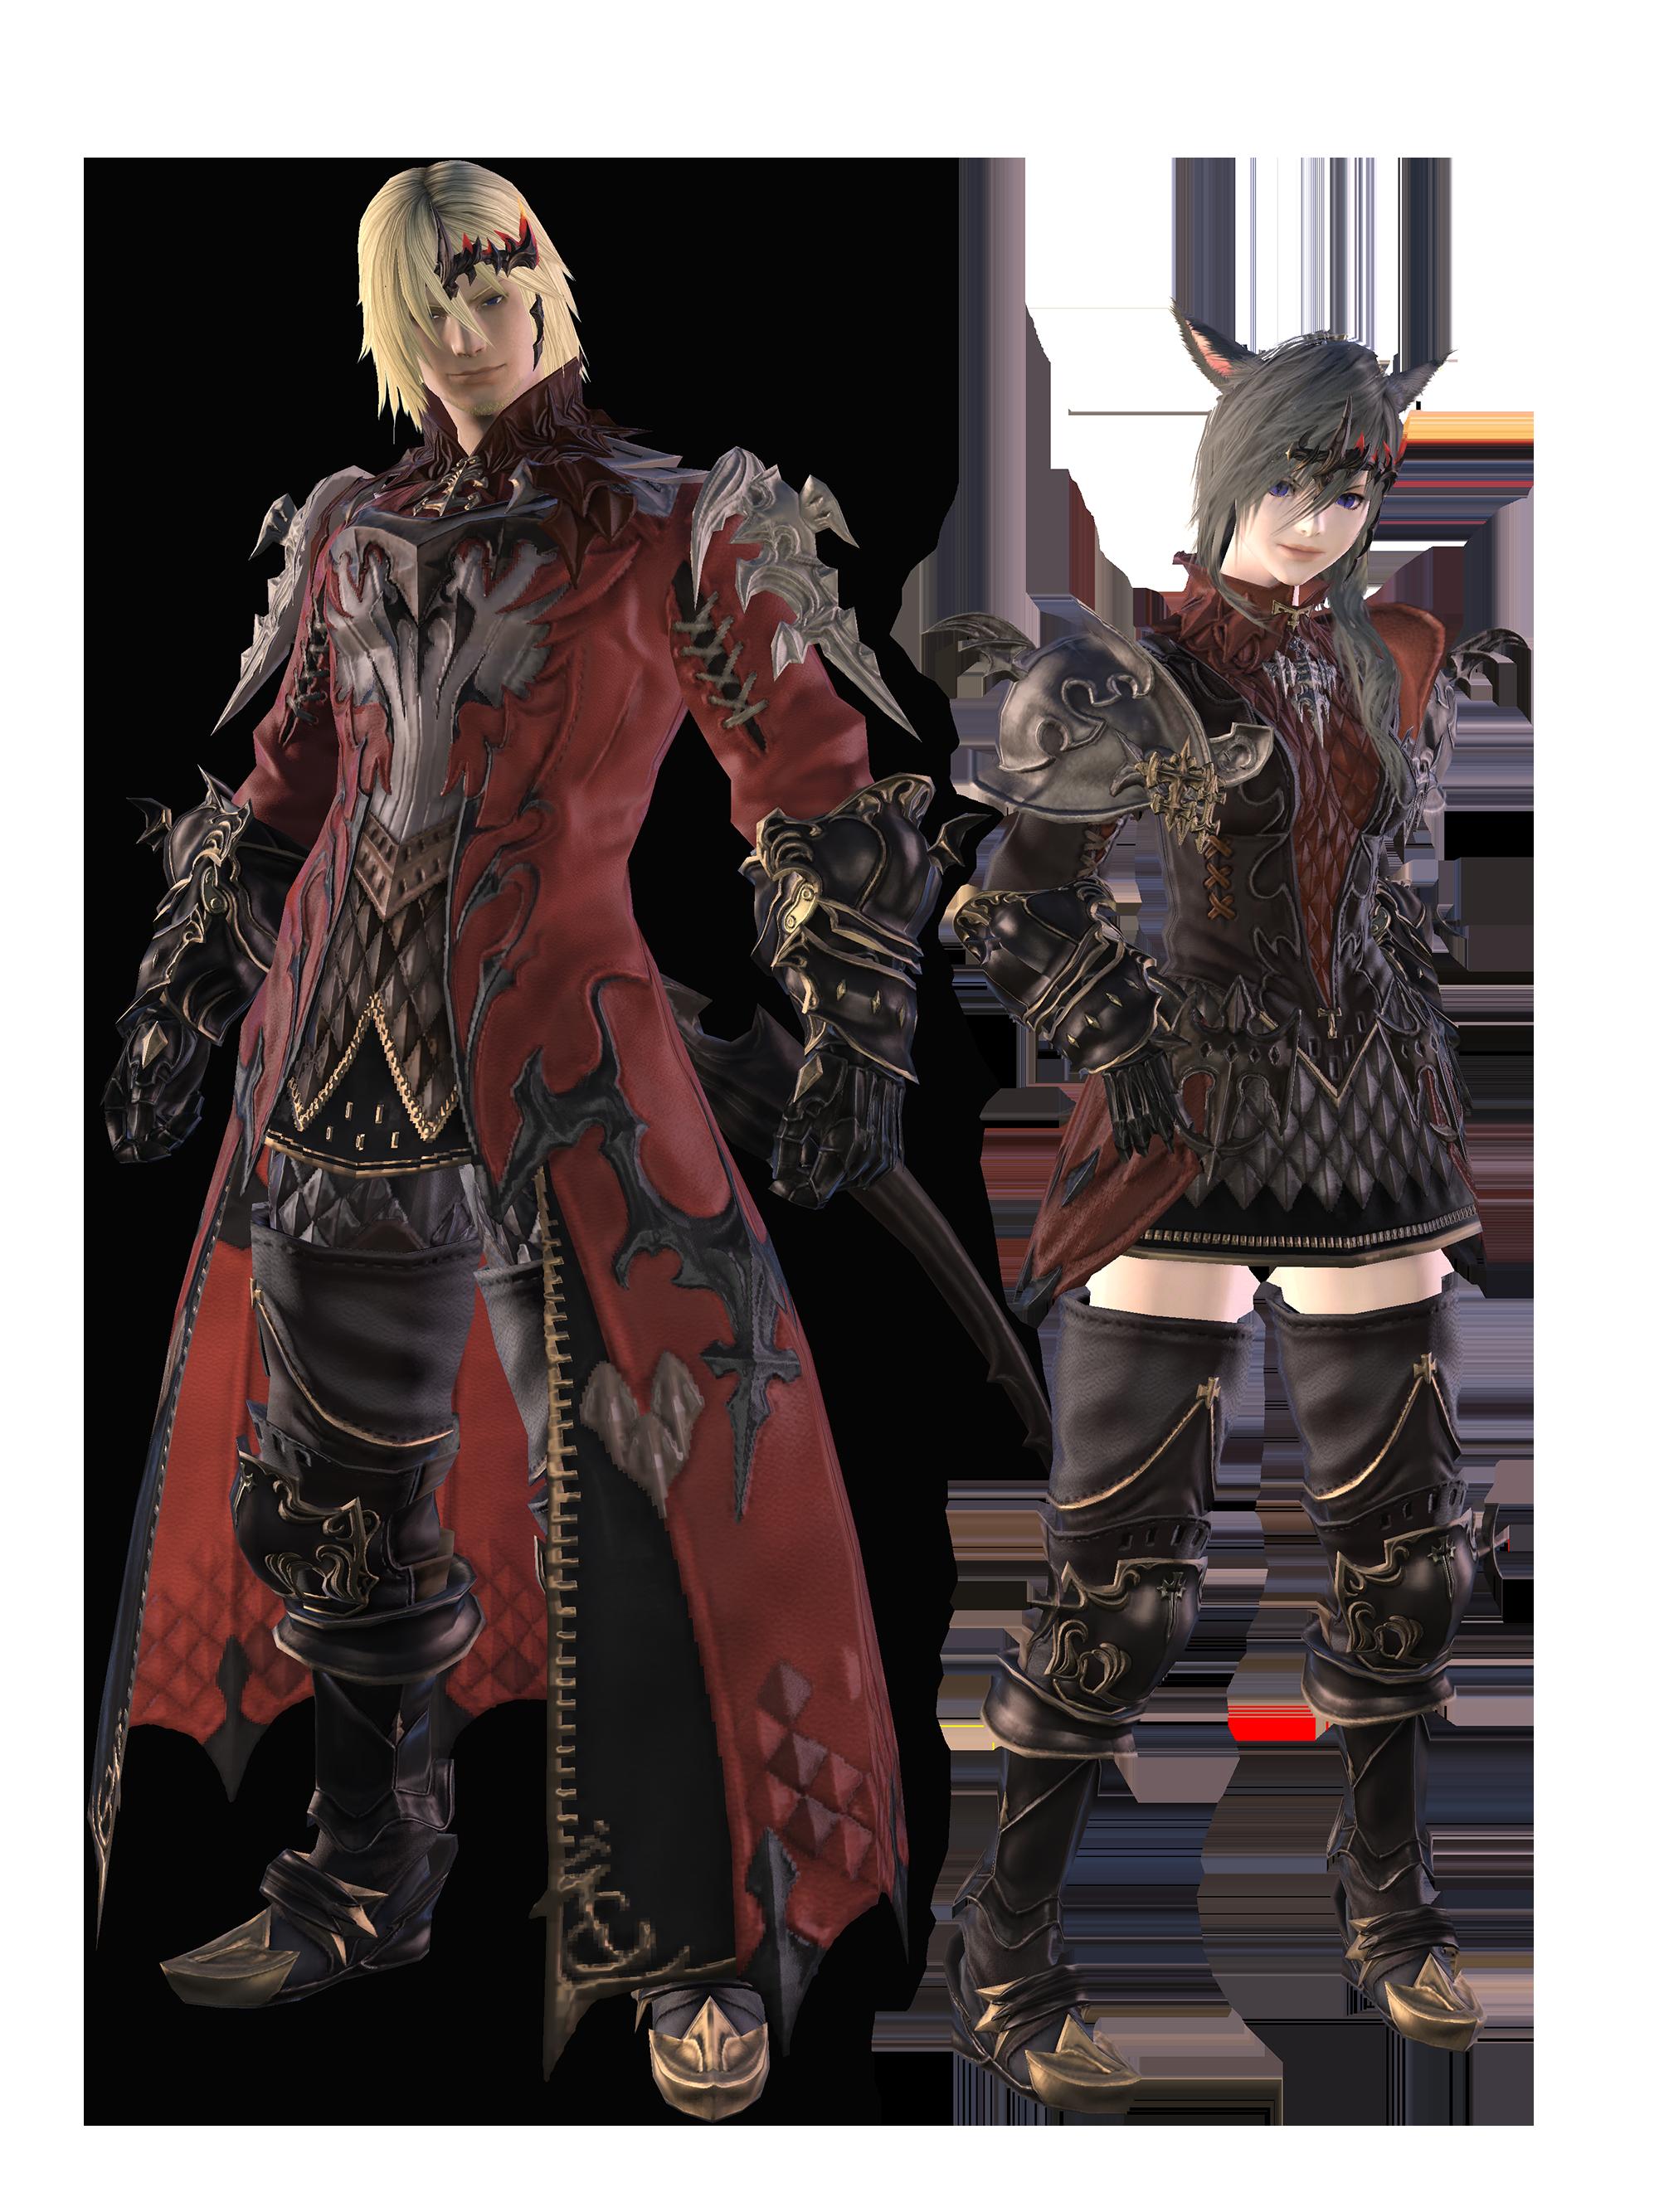 Final Fantasy Xiv X Monster Hunter World Collaboration Render 1